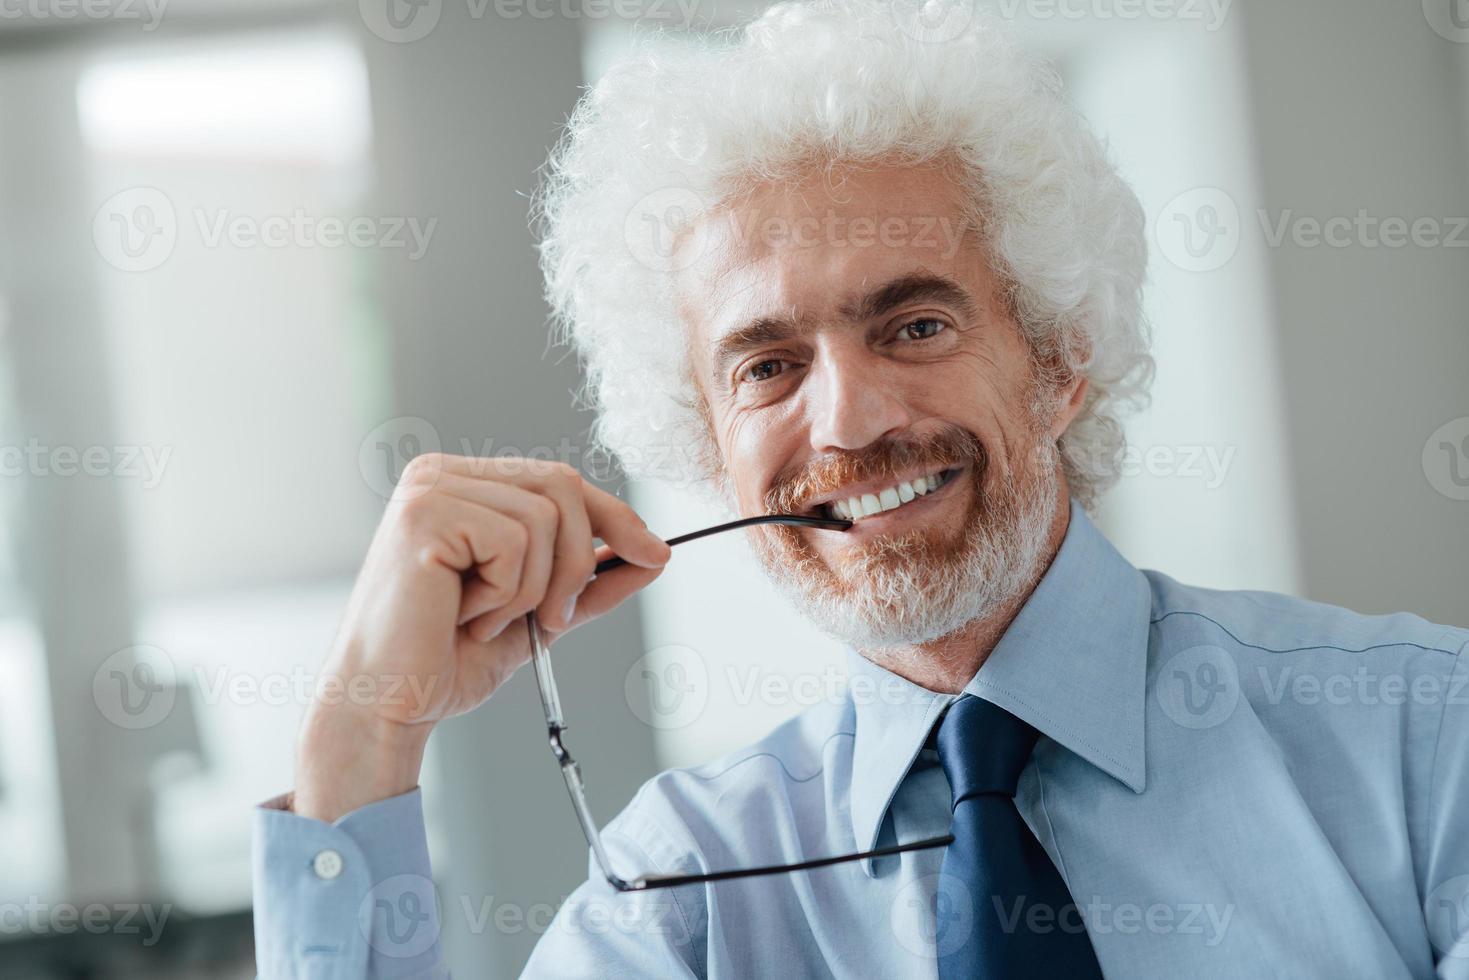 vrolijk zakenmanportret foto